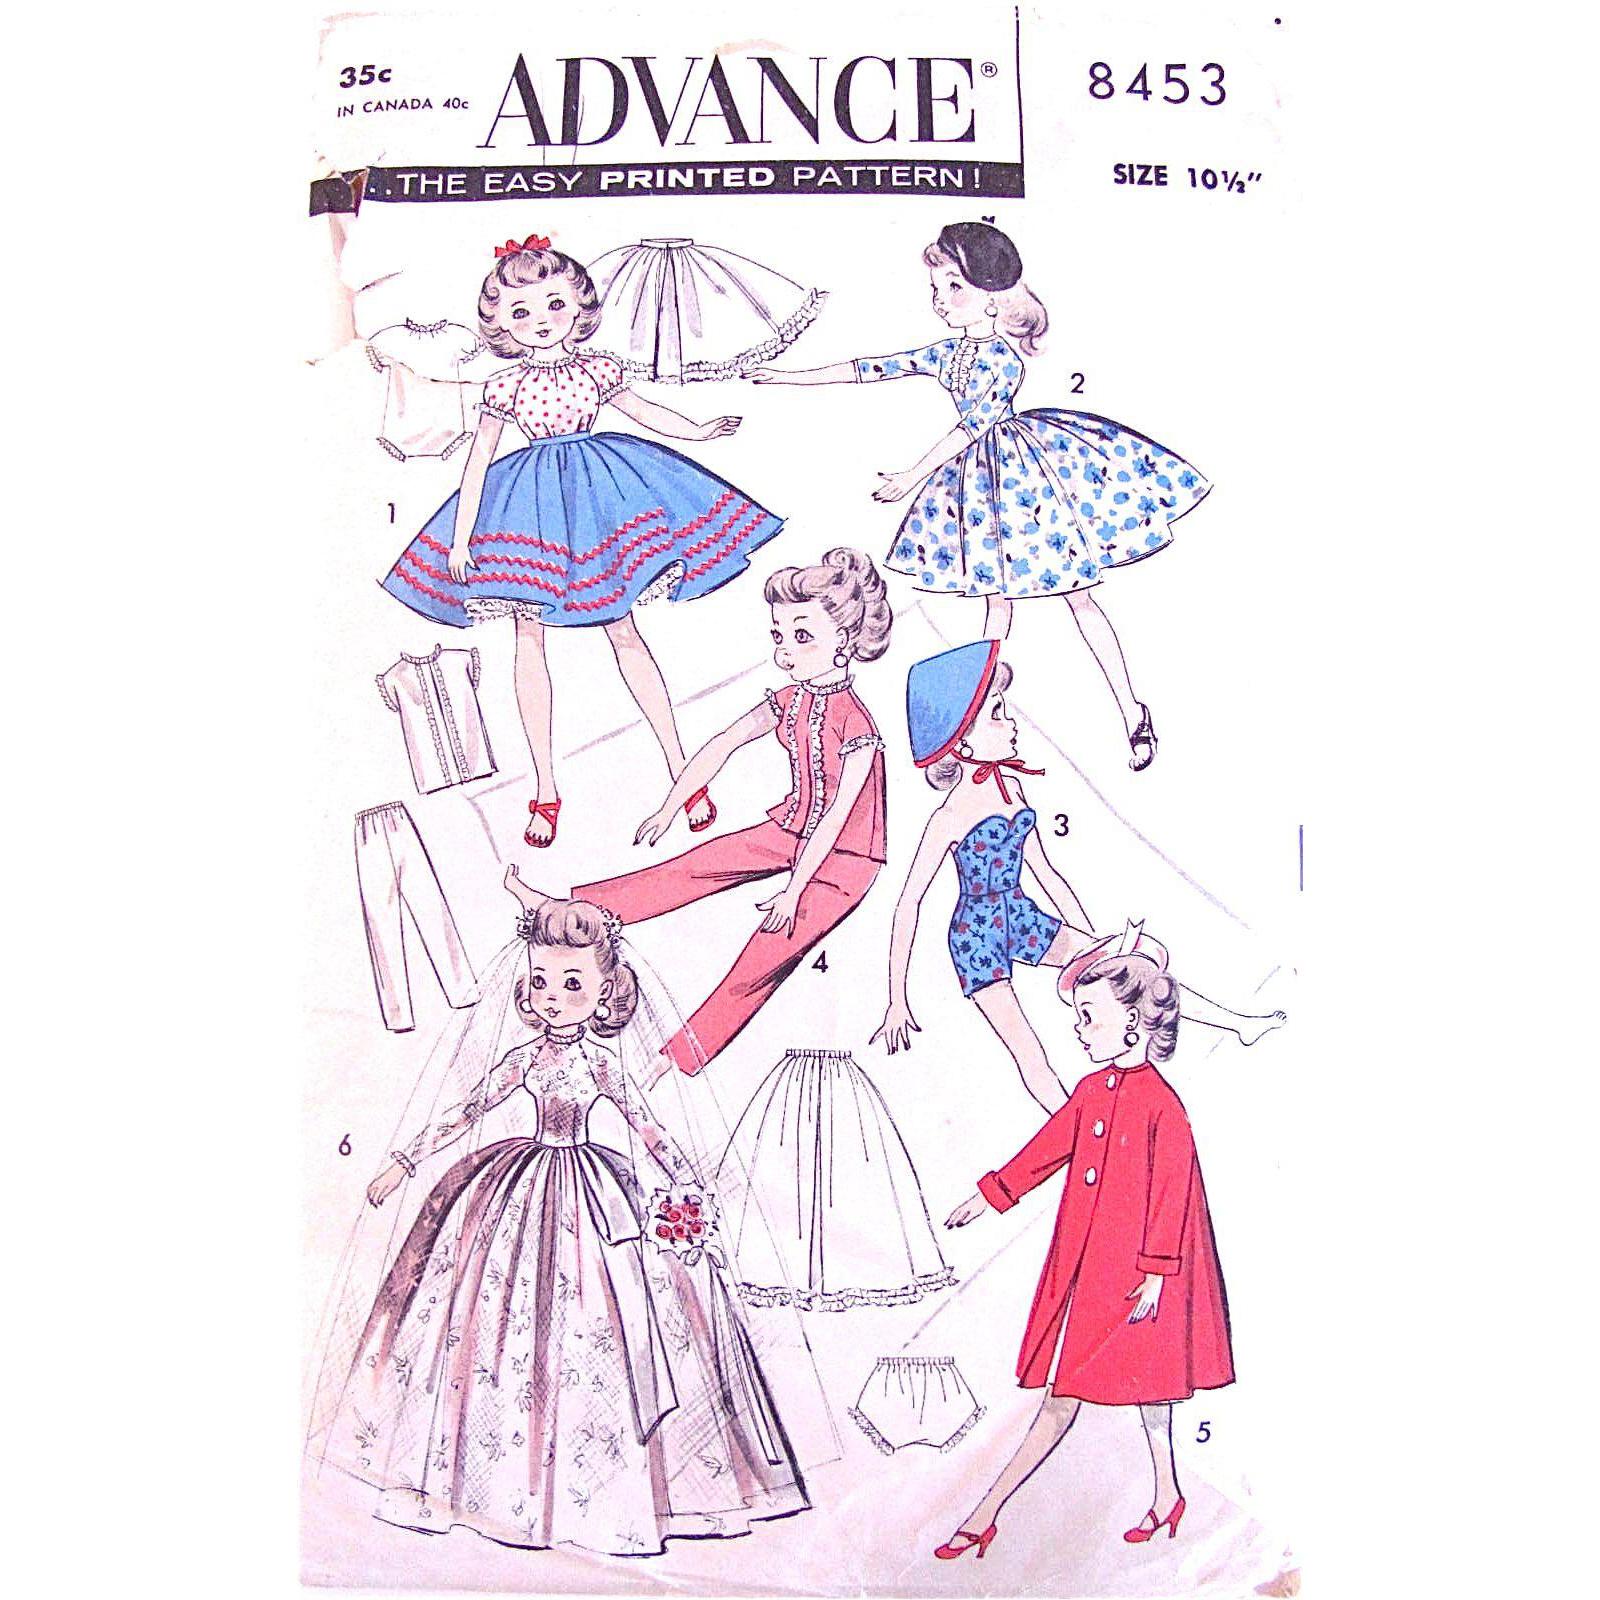 Little Miss Revlon Doll Brides Wardrobe Pattern, Uncut, Advance 8453, Size 10-1/2 Inch, Vintage 1960s